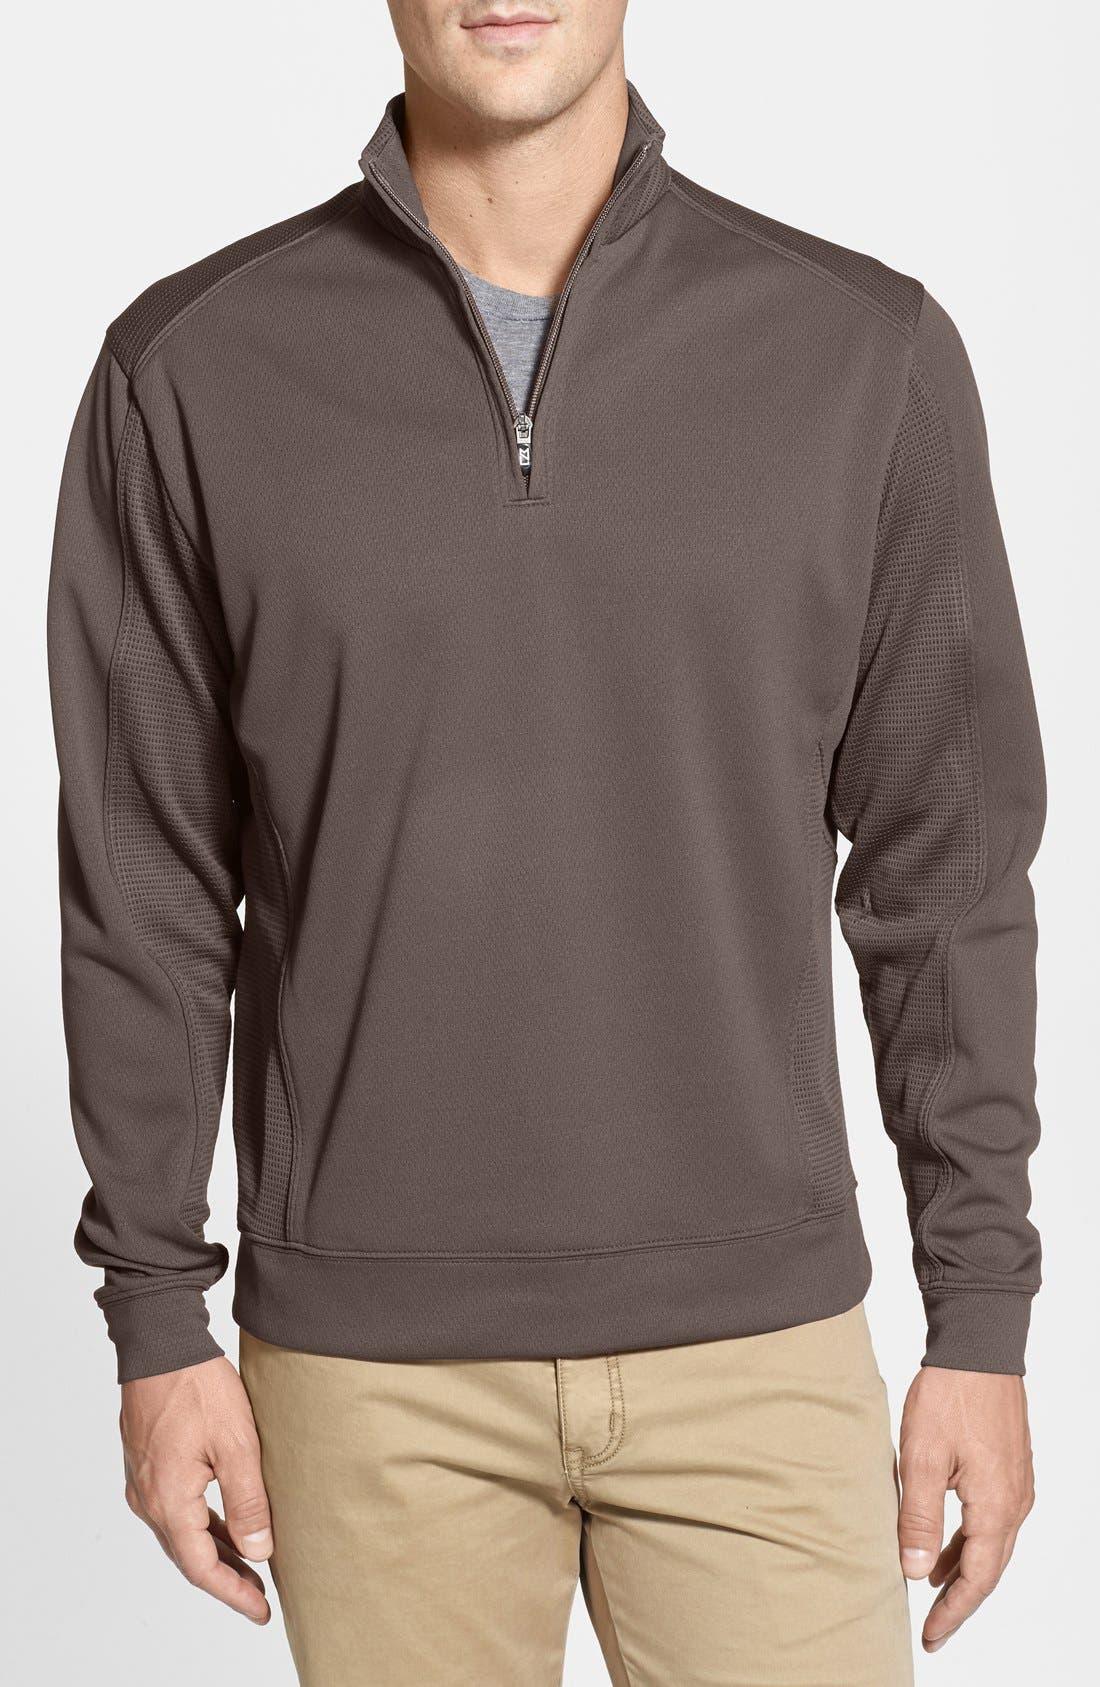 Alternate Image 1 Selected - Cutter & Buck DryTec Half Zip Pullover (Big & Tall)